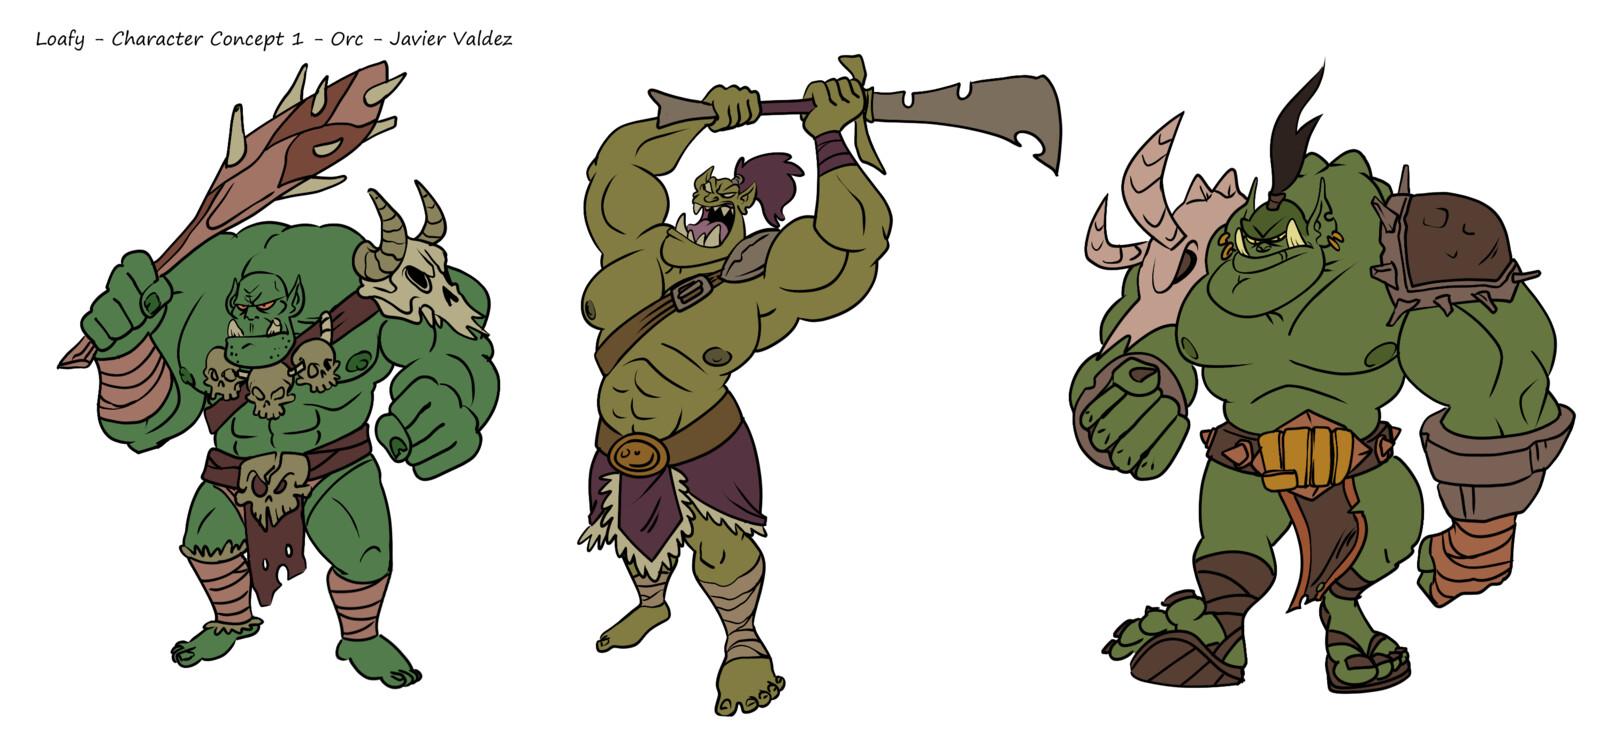 Orc development